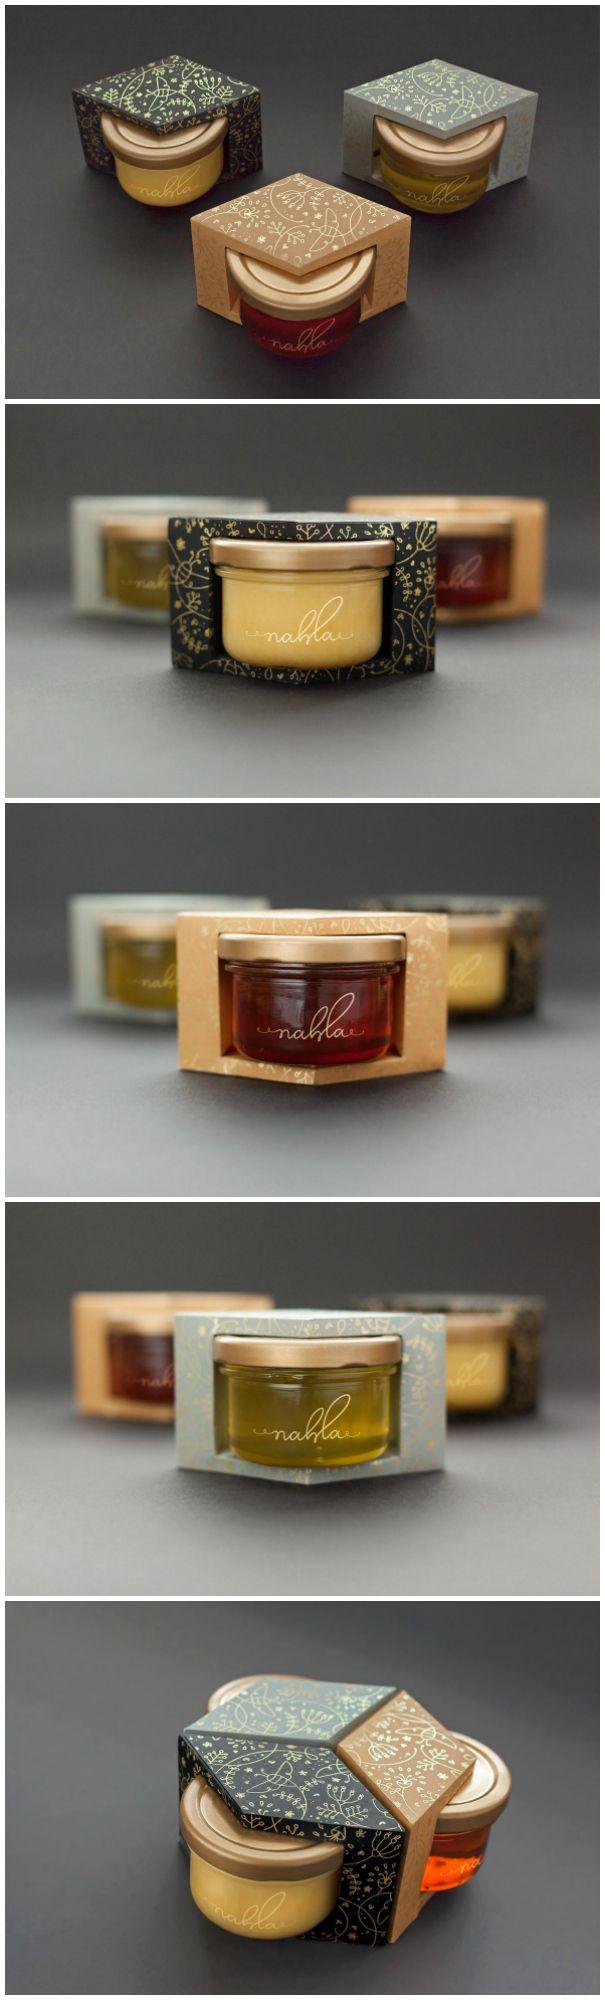 Premium Raw Organic Ethiopian Honey Branding and Packaging Design Design Agency:Cre8tive Pixels  Project Name:NAHLA Raw Organic Ethiopian Honey Location:United Kingdom Category: #Cupboard #Honey #Food